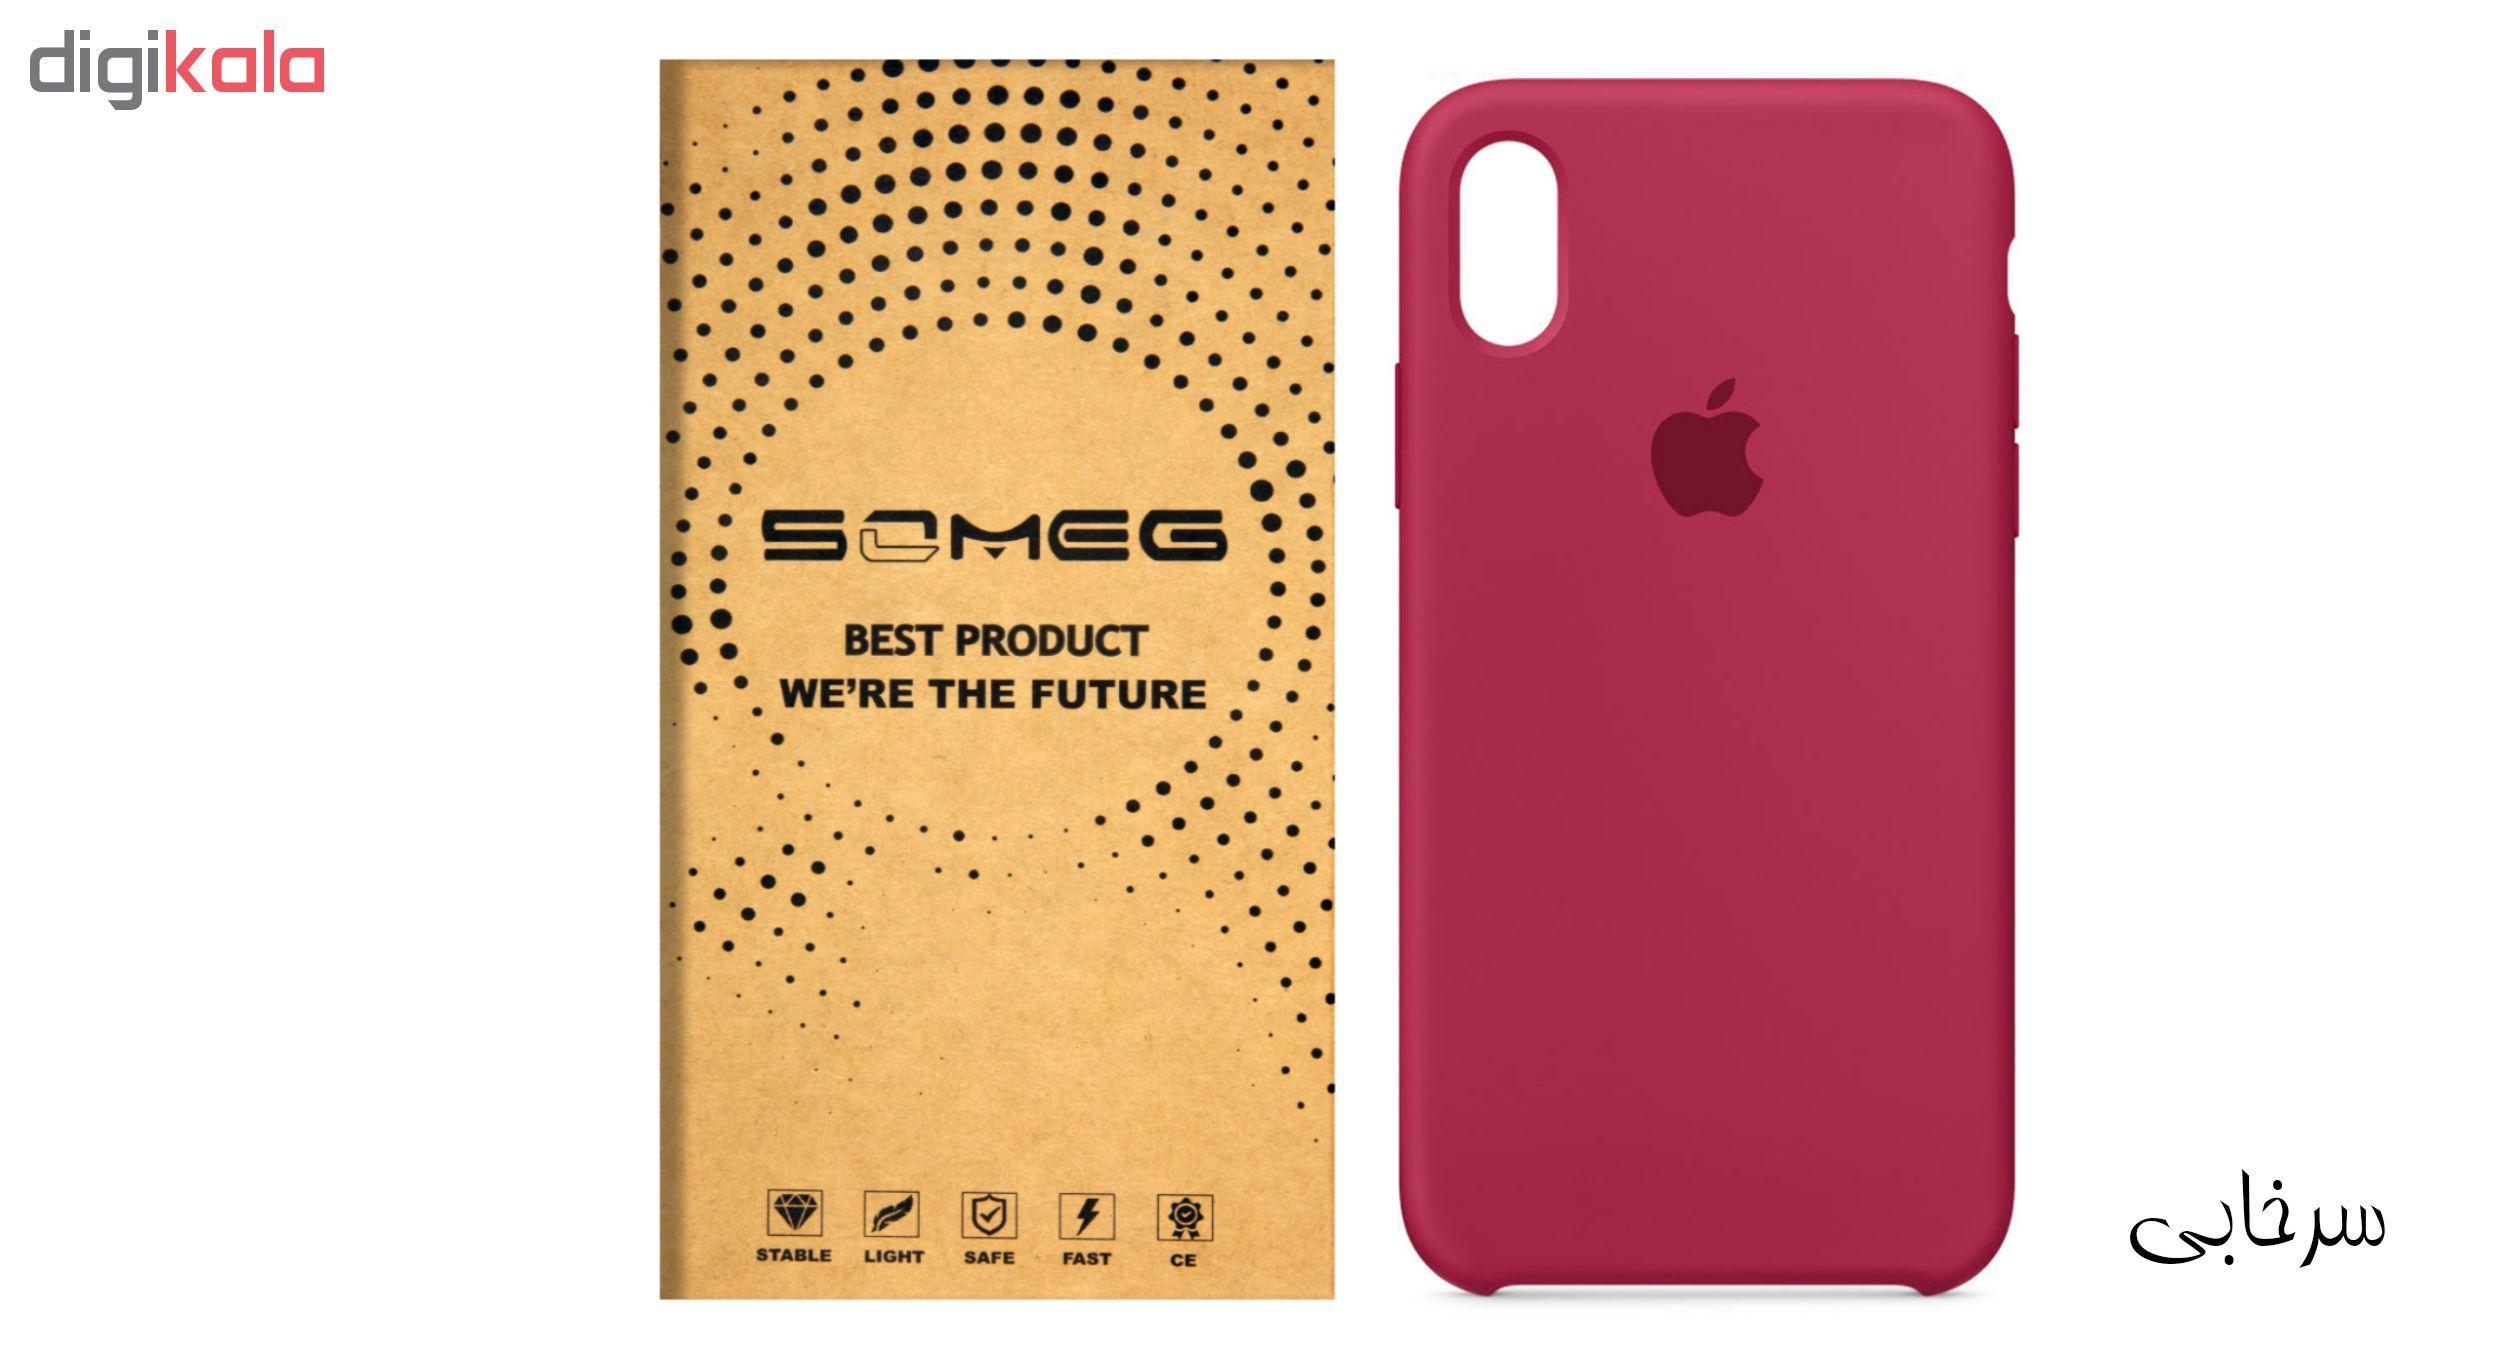 کاور سومگ مدل SIC مناسب برای گوشی موبایل اپل iPhone X  main 1 21